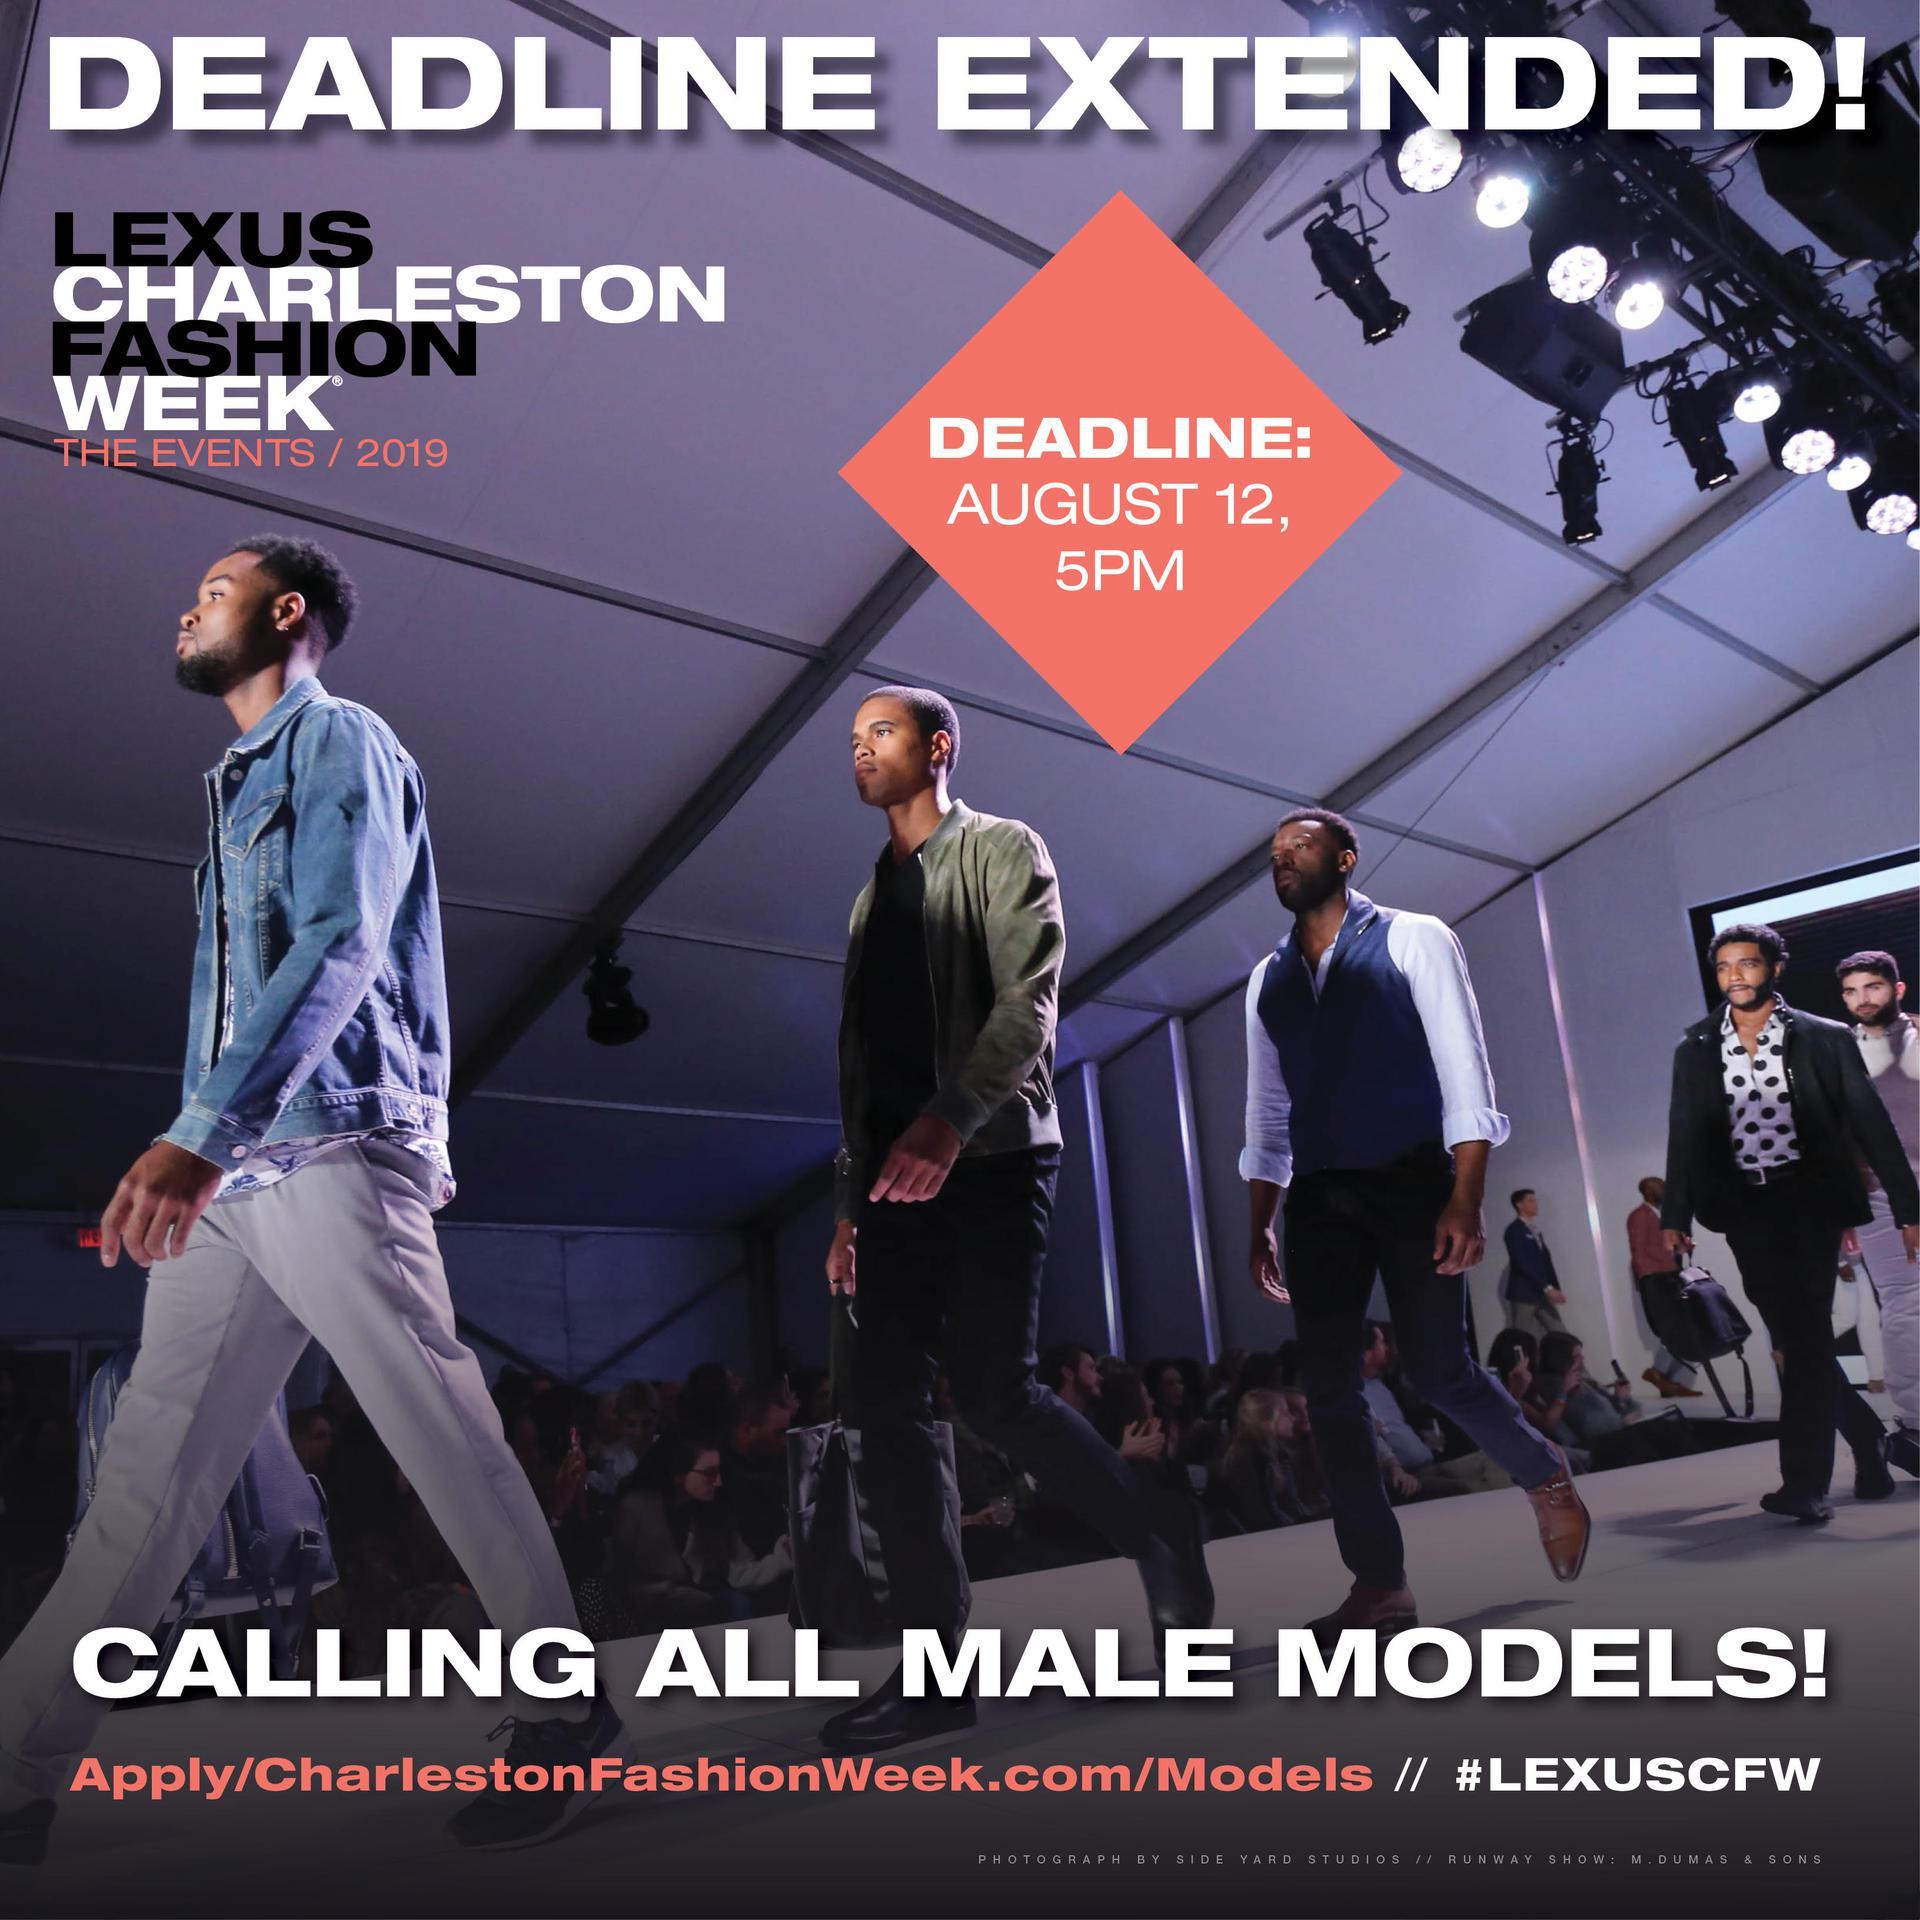 Lexus 2019 CFW - Calling All Male Models - Deadline Extended!